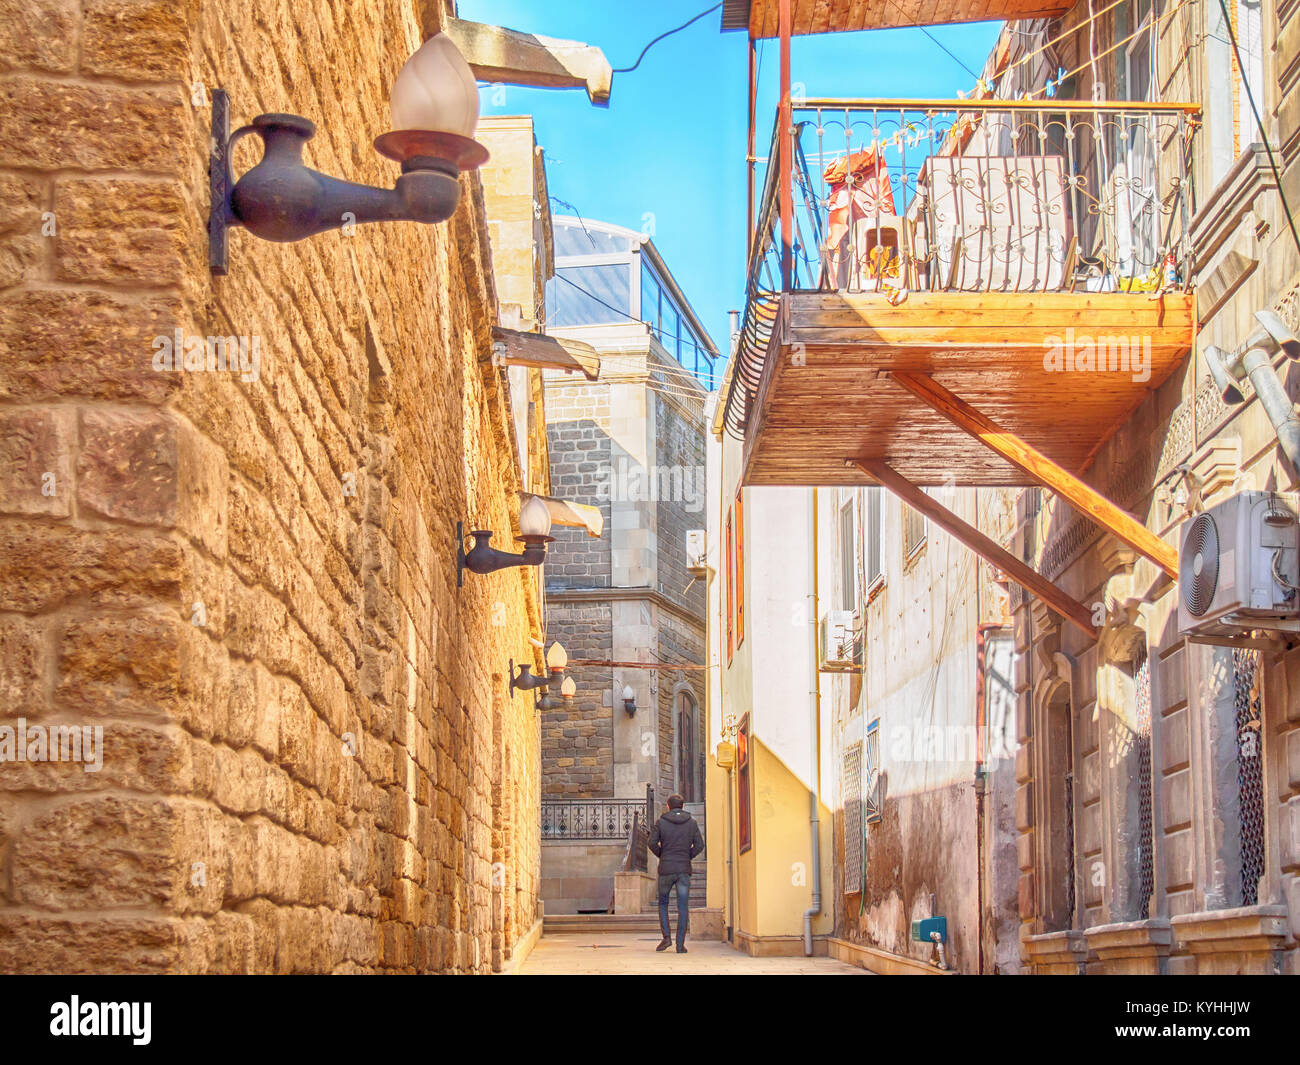 Street in Baku old town (HDR) - Stock Image